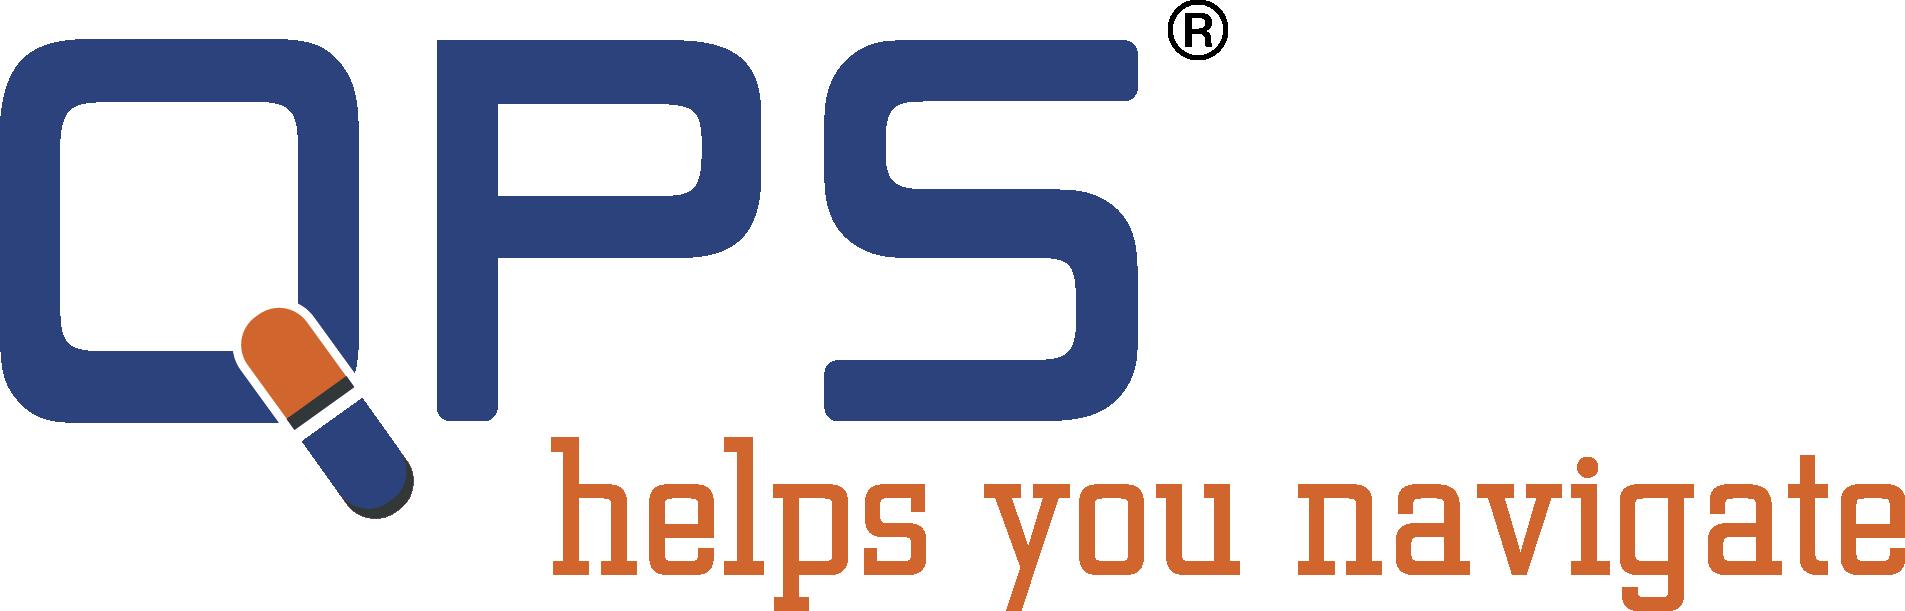 QPSR logo